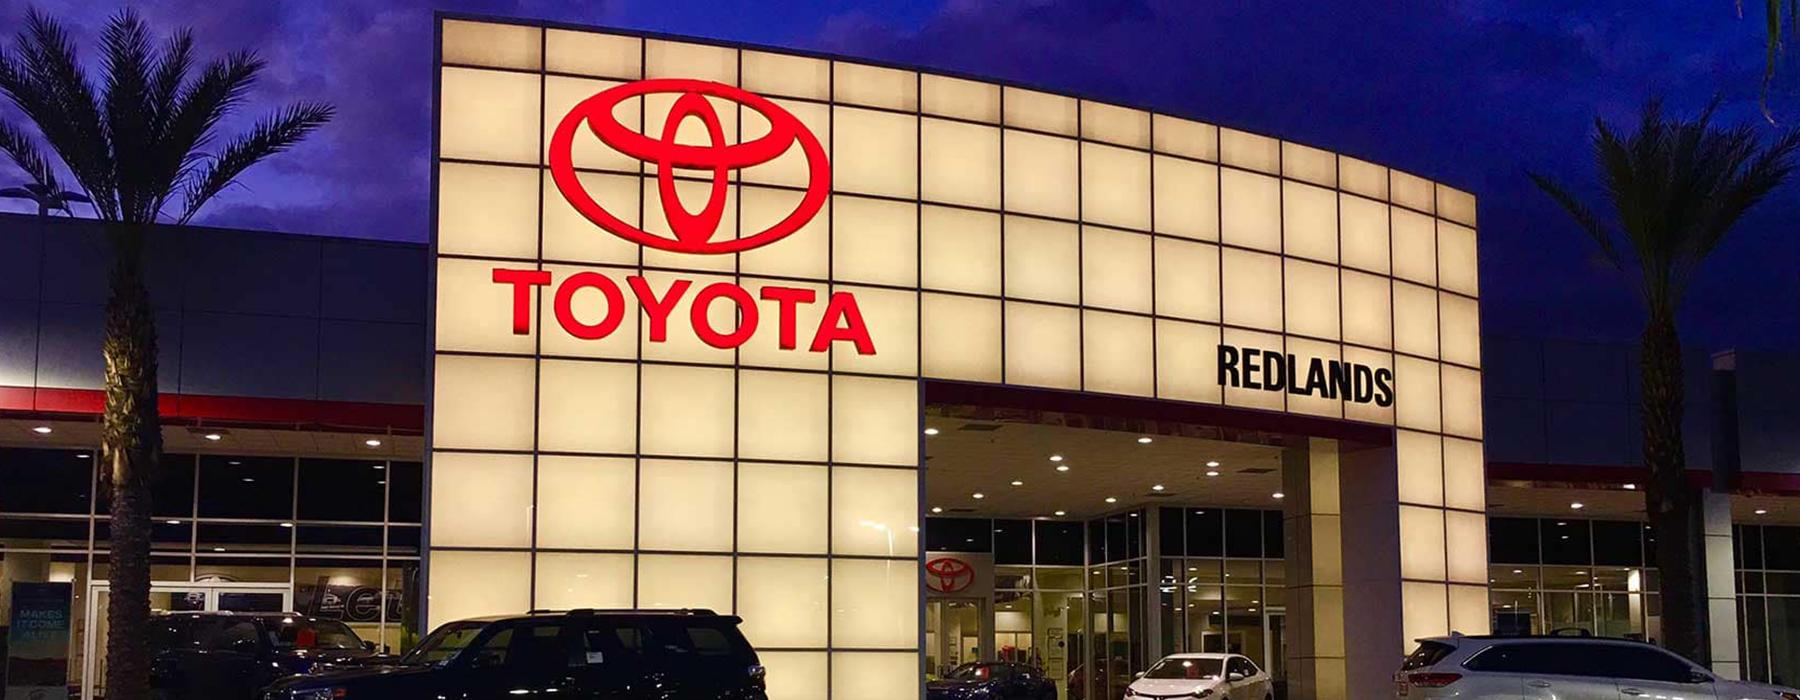 Toyota Of Redlands Toyota Dealer In Redlands CA - Where is the nearest toyota dealership